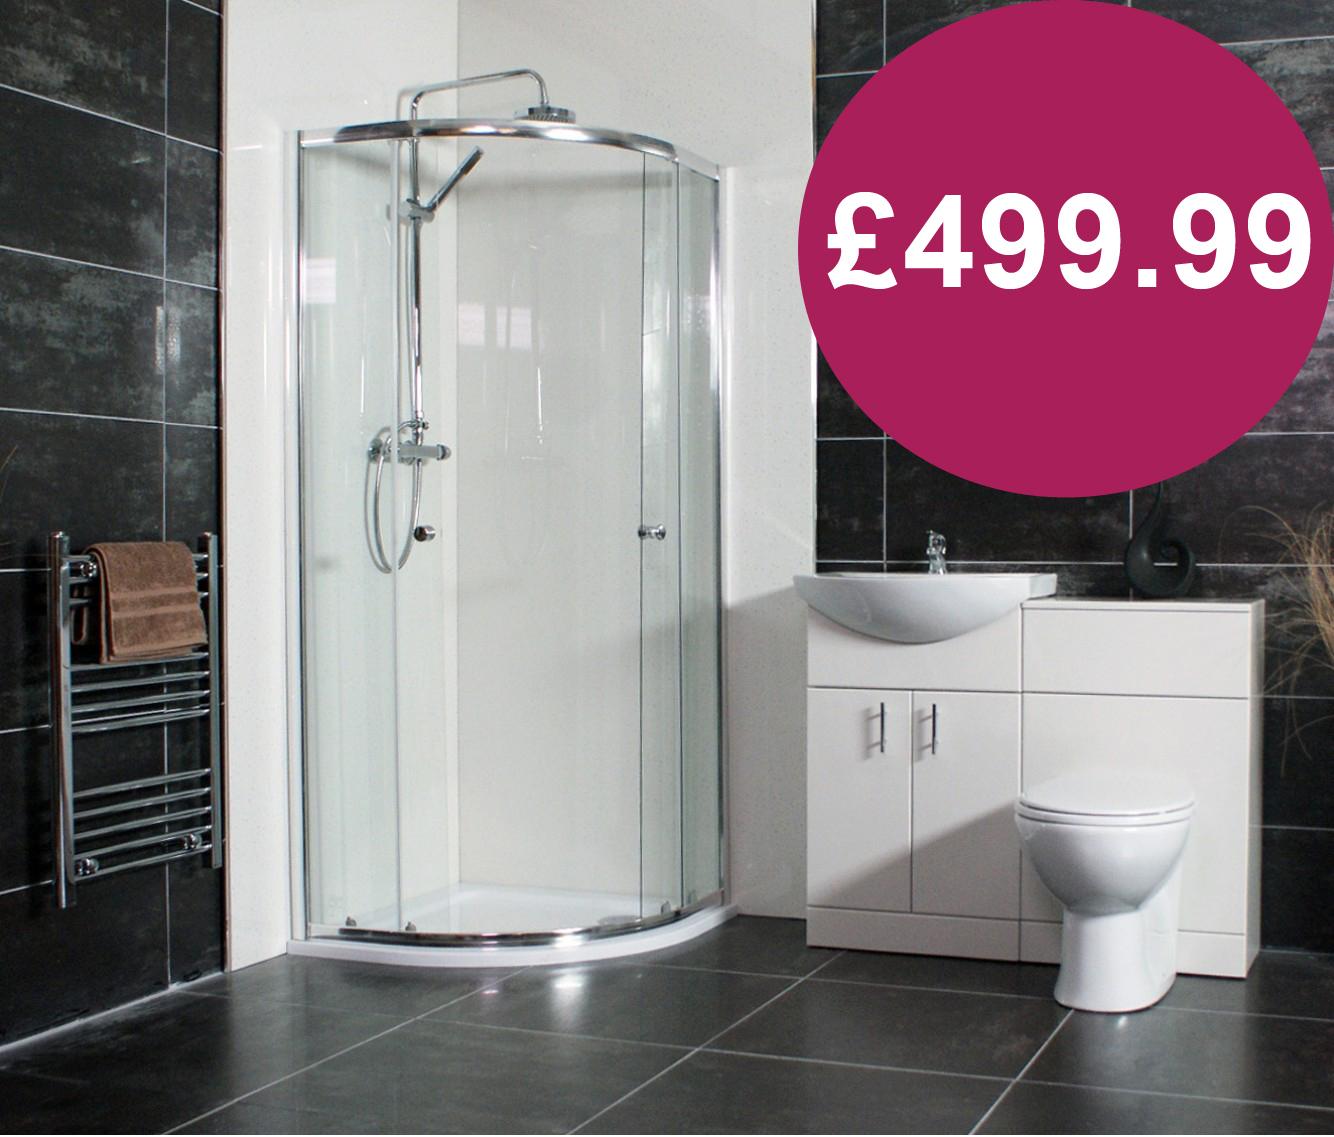 Tecaz bathroom suites - Complete Shower Package Includes Dual Head Thermostatic Shower Set Units Toilet Basin